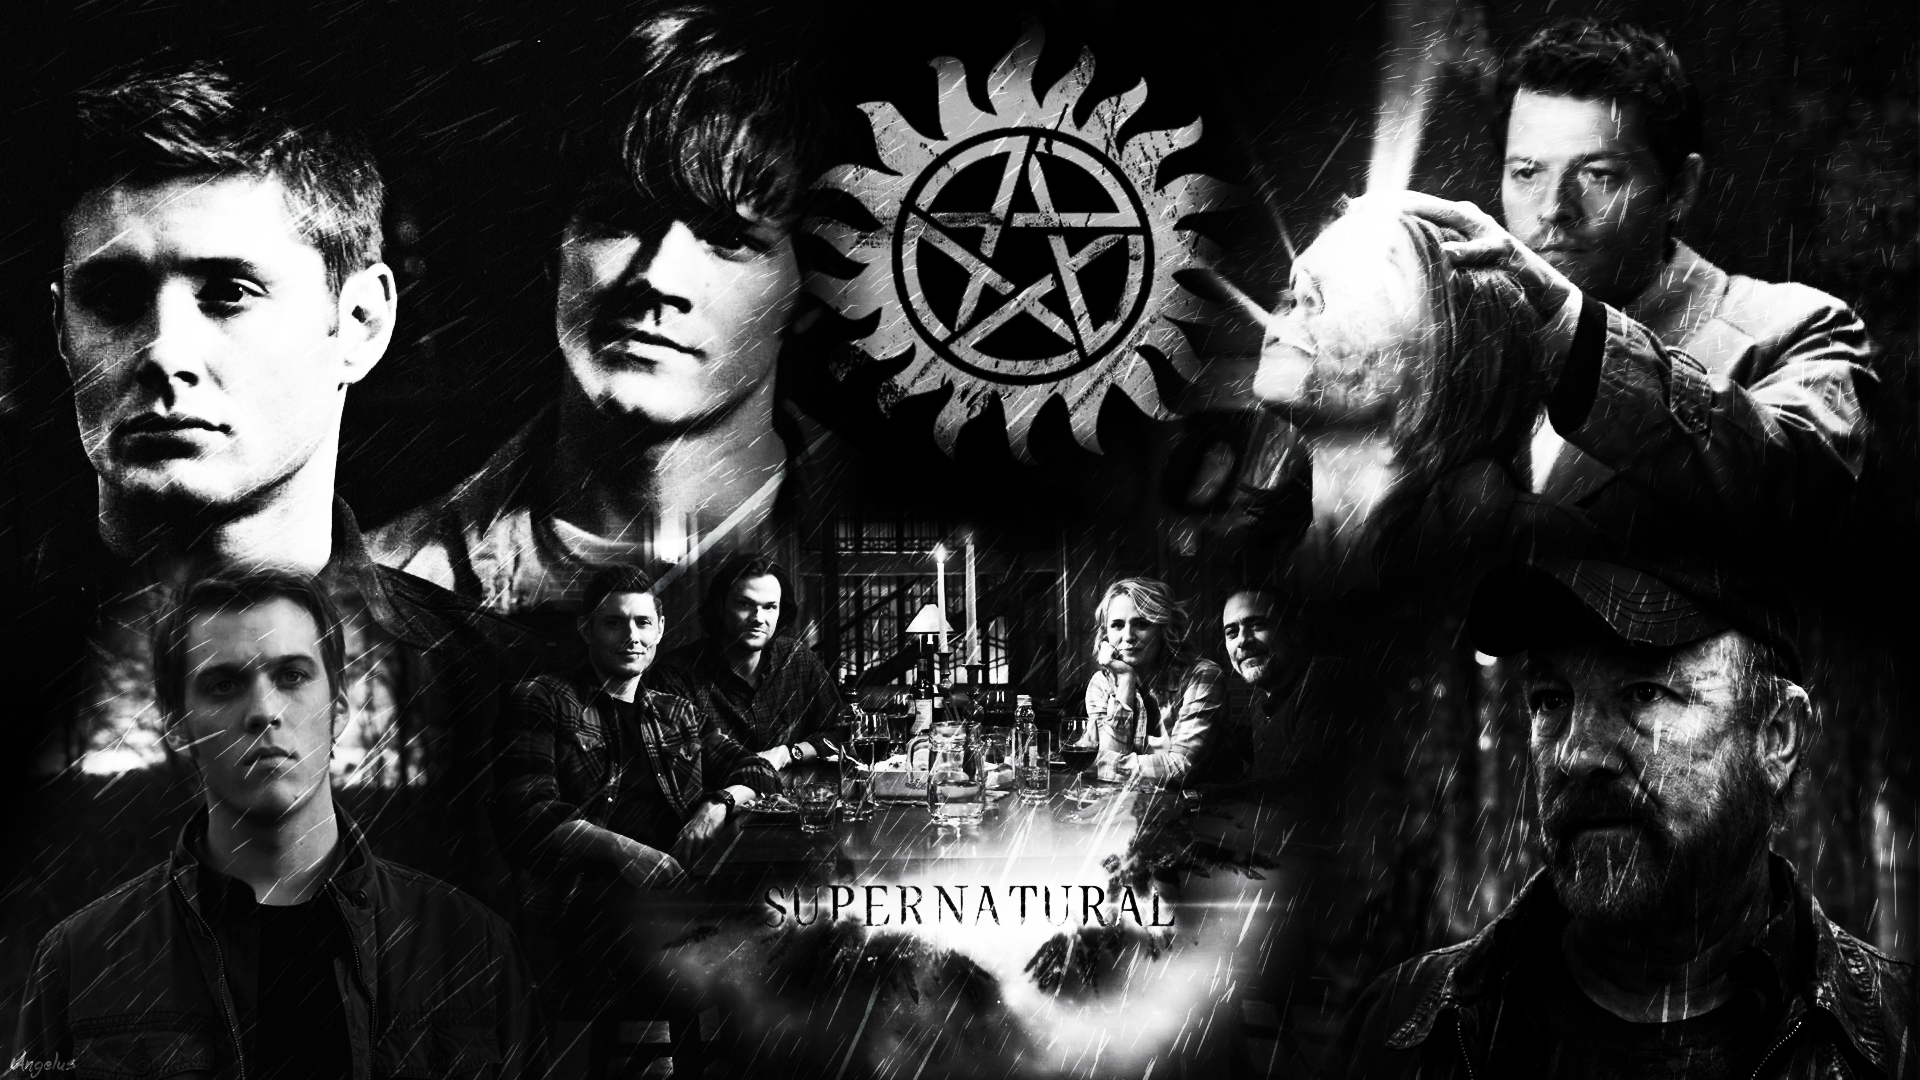 Supernatural |Family| Wallpaper/Poster HD by Angelus23 on DeviantArt